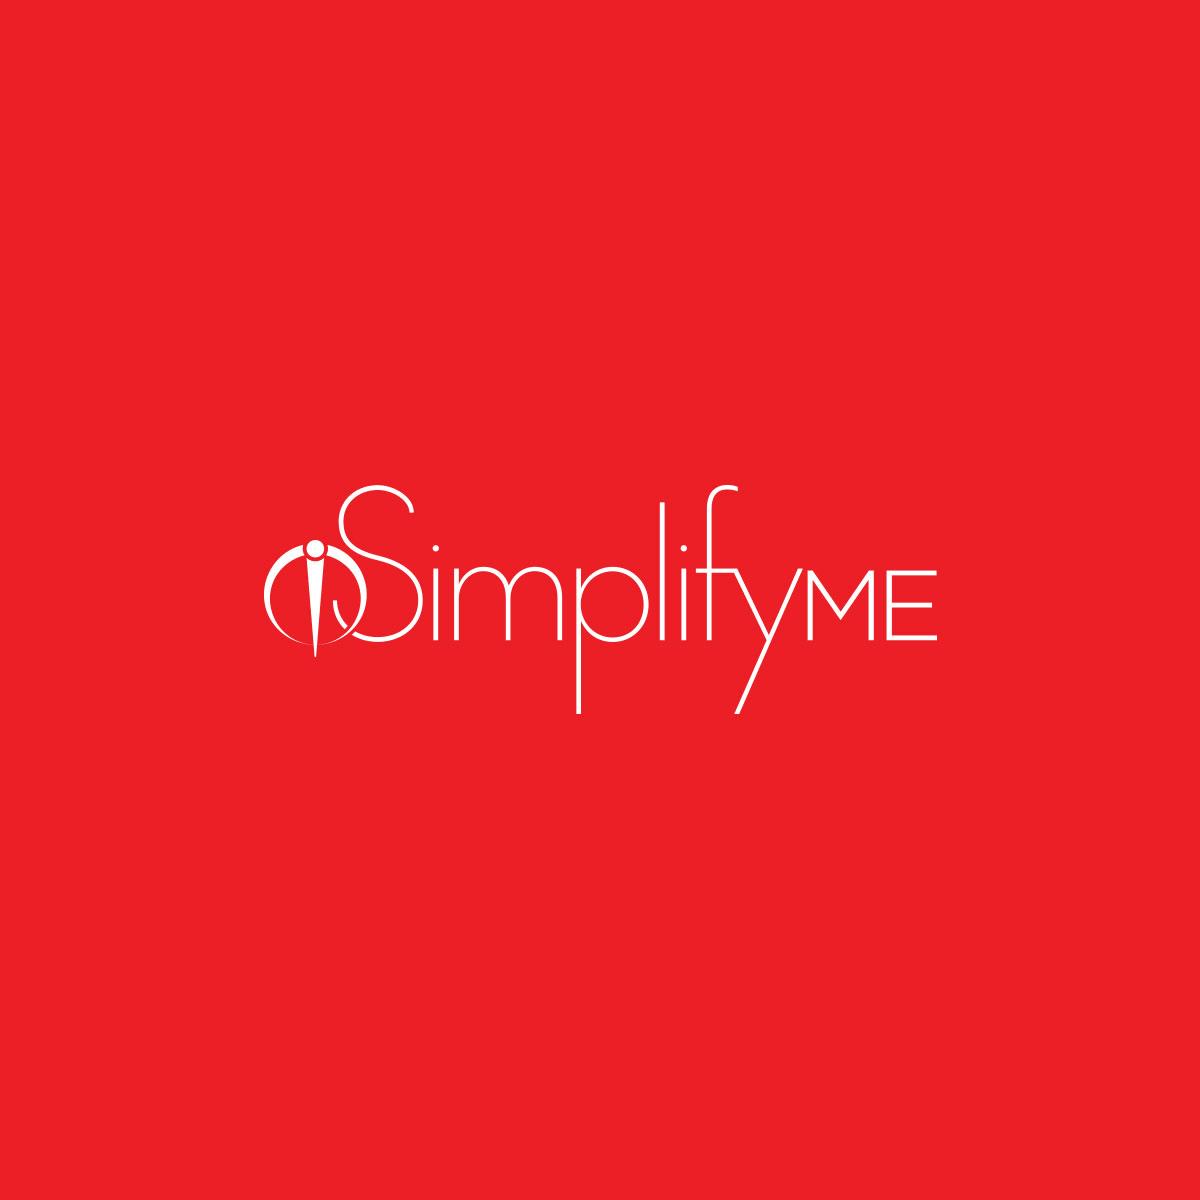 SimplifyMe's logo